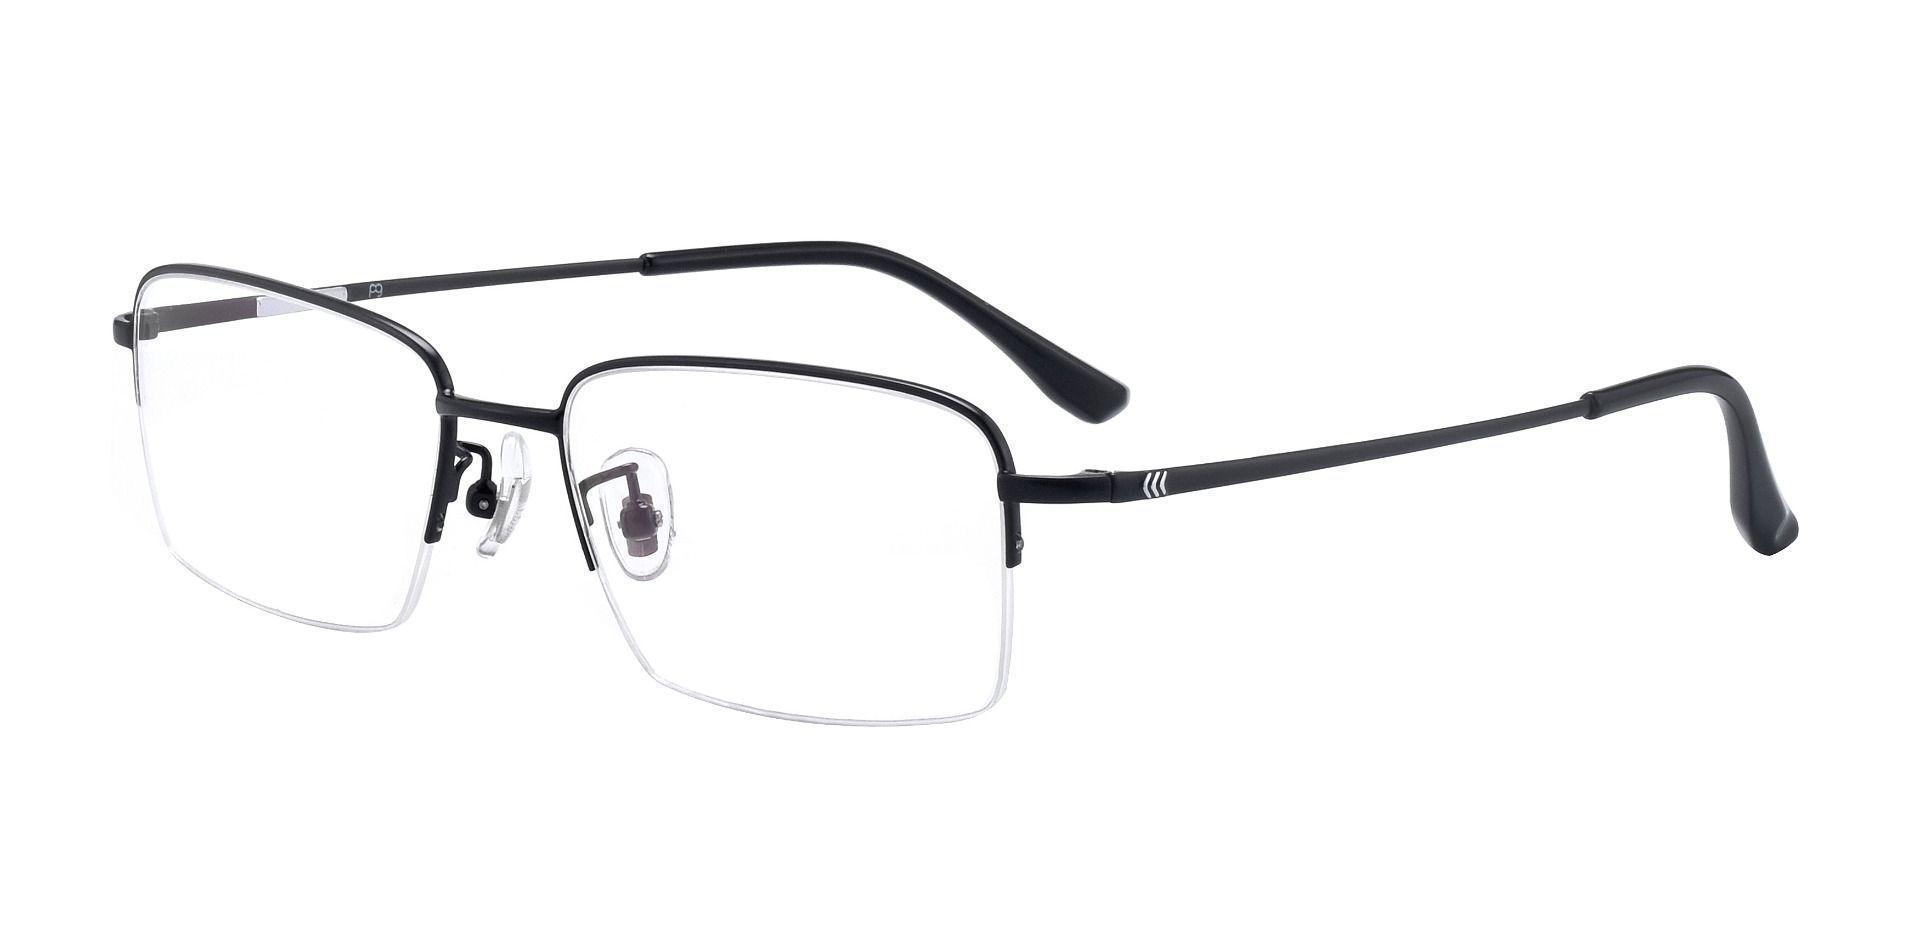 Welty Rectangle Prescription Glasses - Black